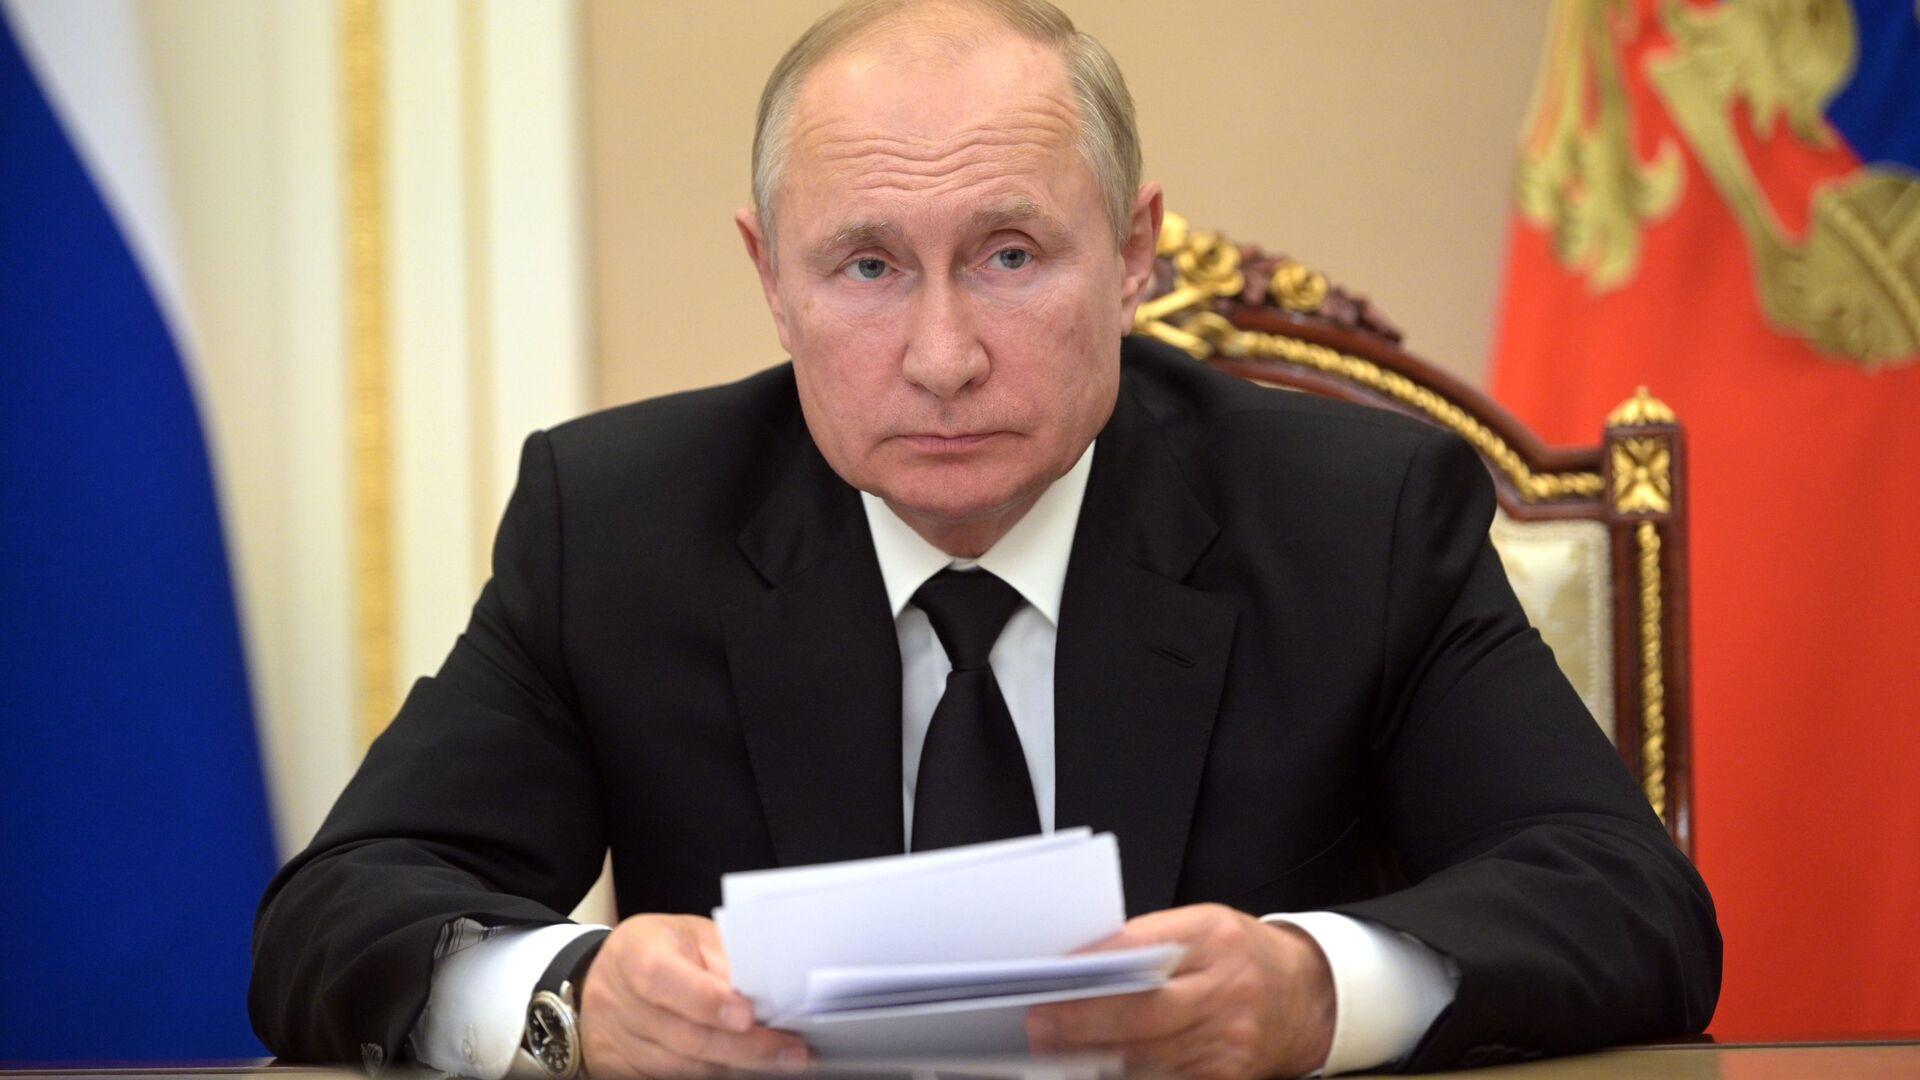 Президент РФ В. Путин провел заседание оргкомитета Победа - Sputnik Абхазия, 1920, 22.09.2021